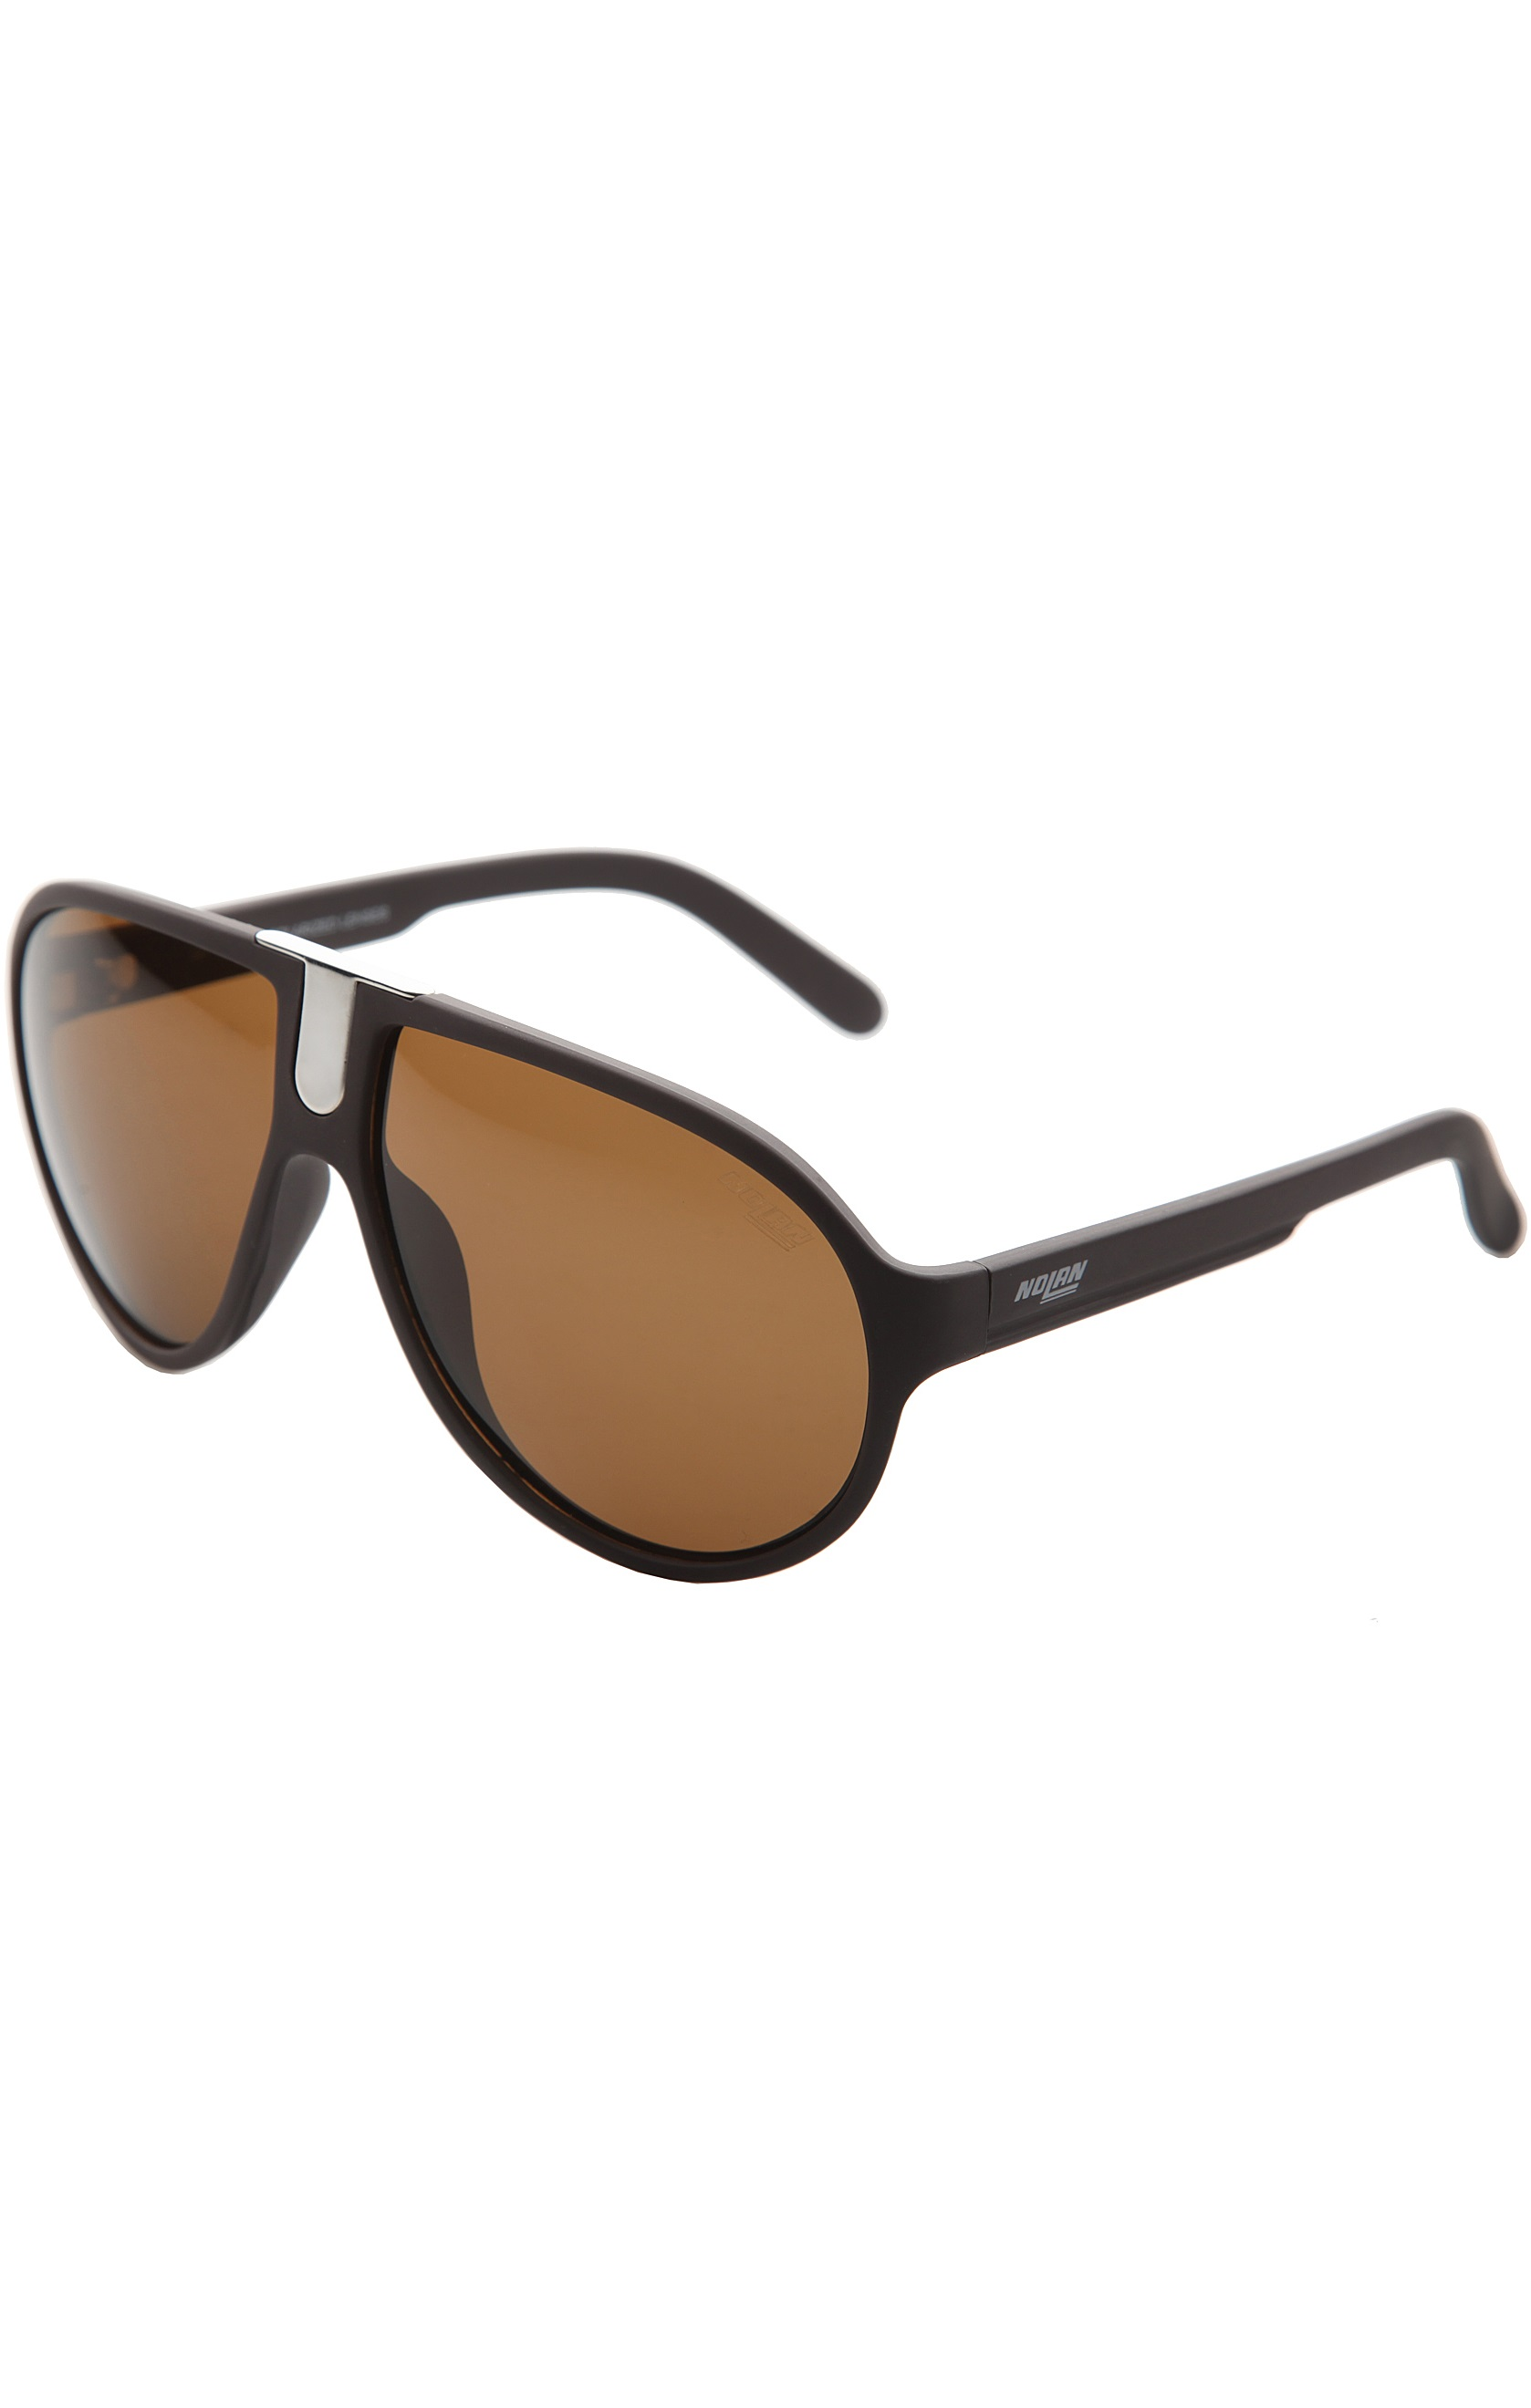 Sunglasses Nolan N333 B